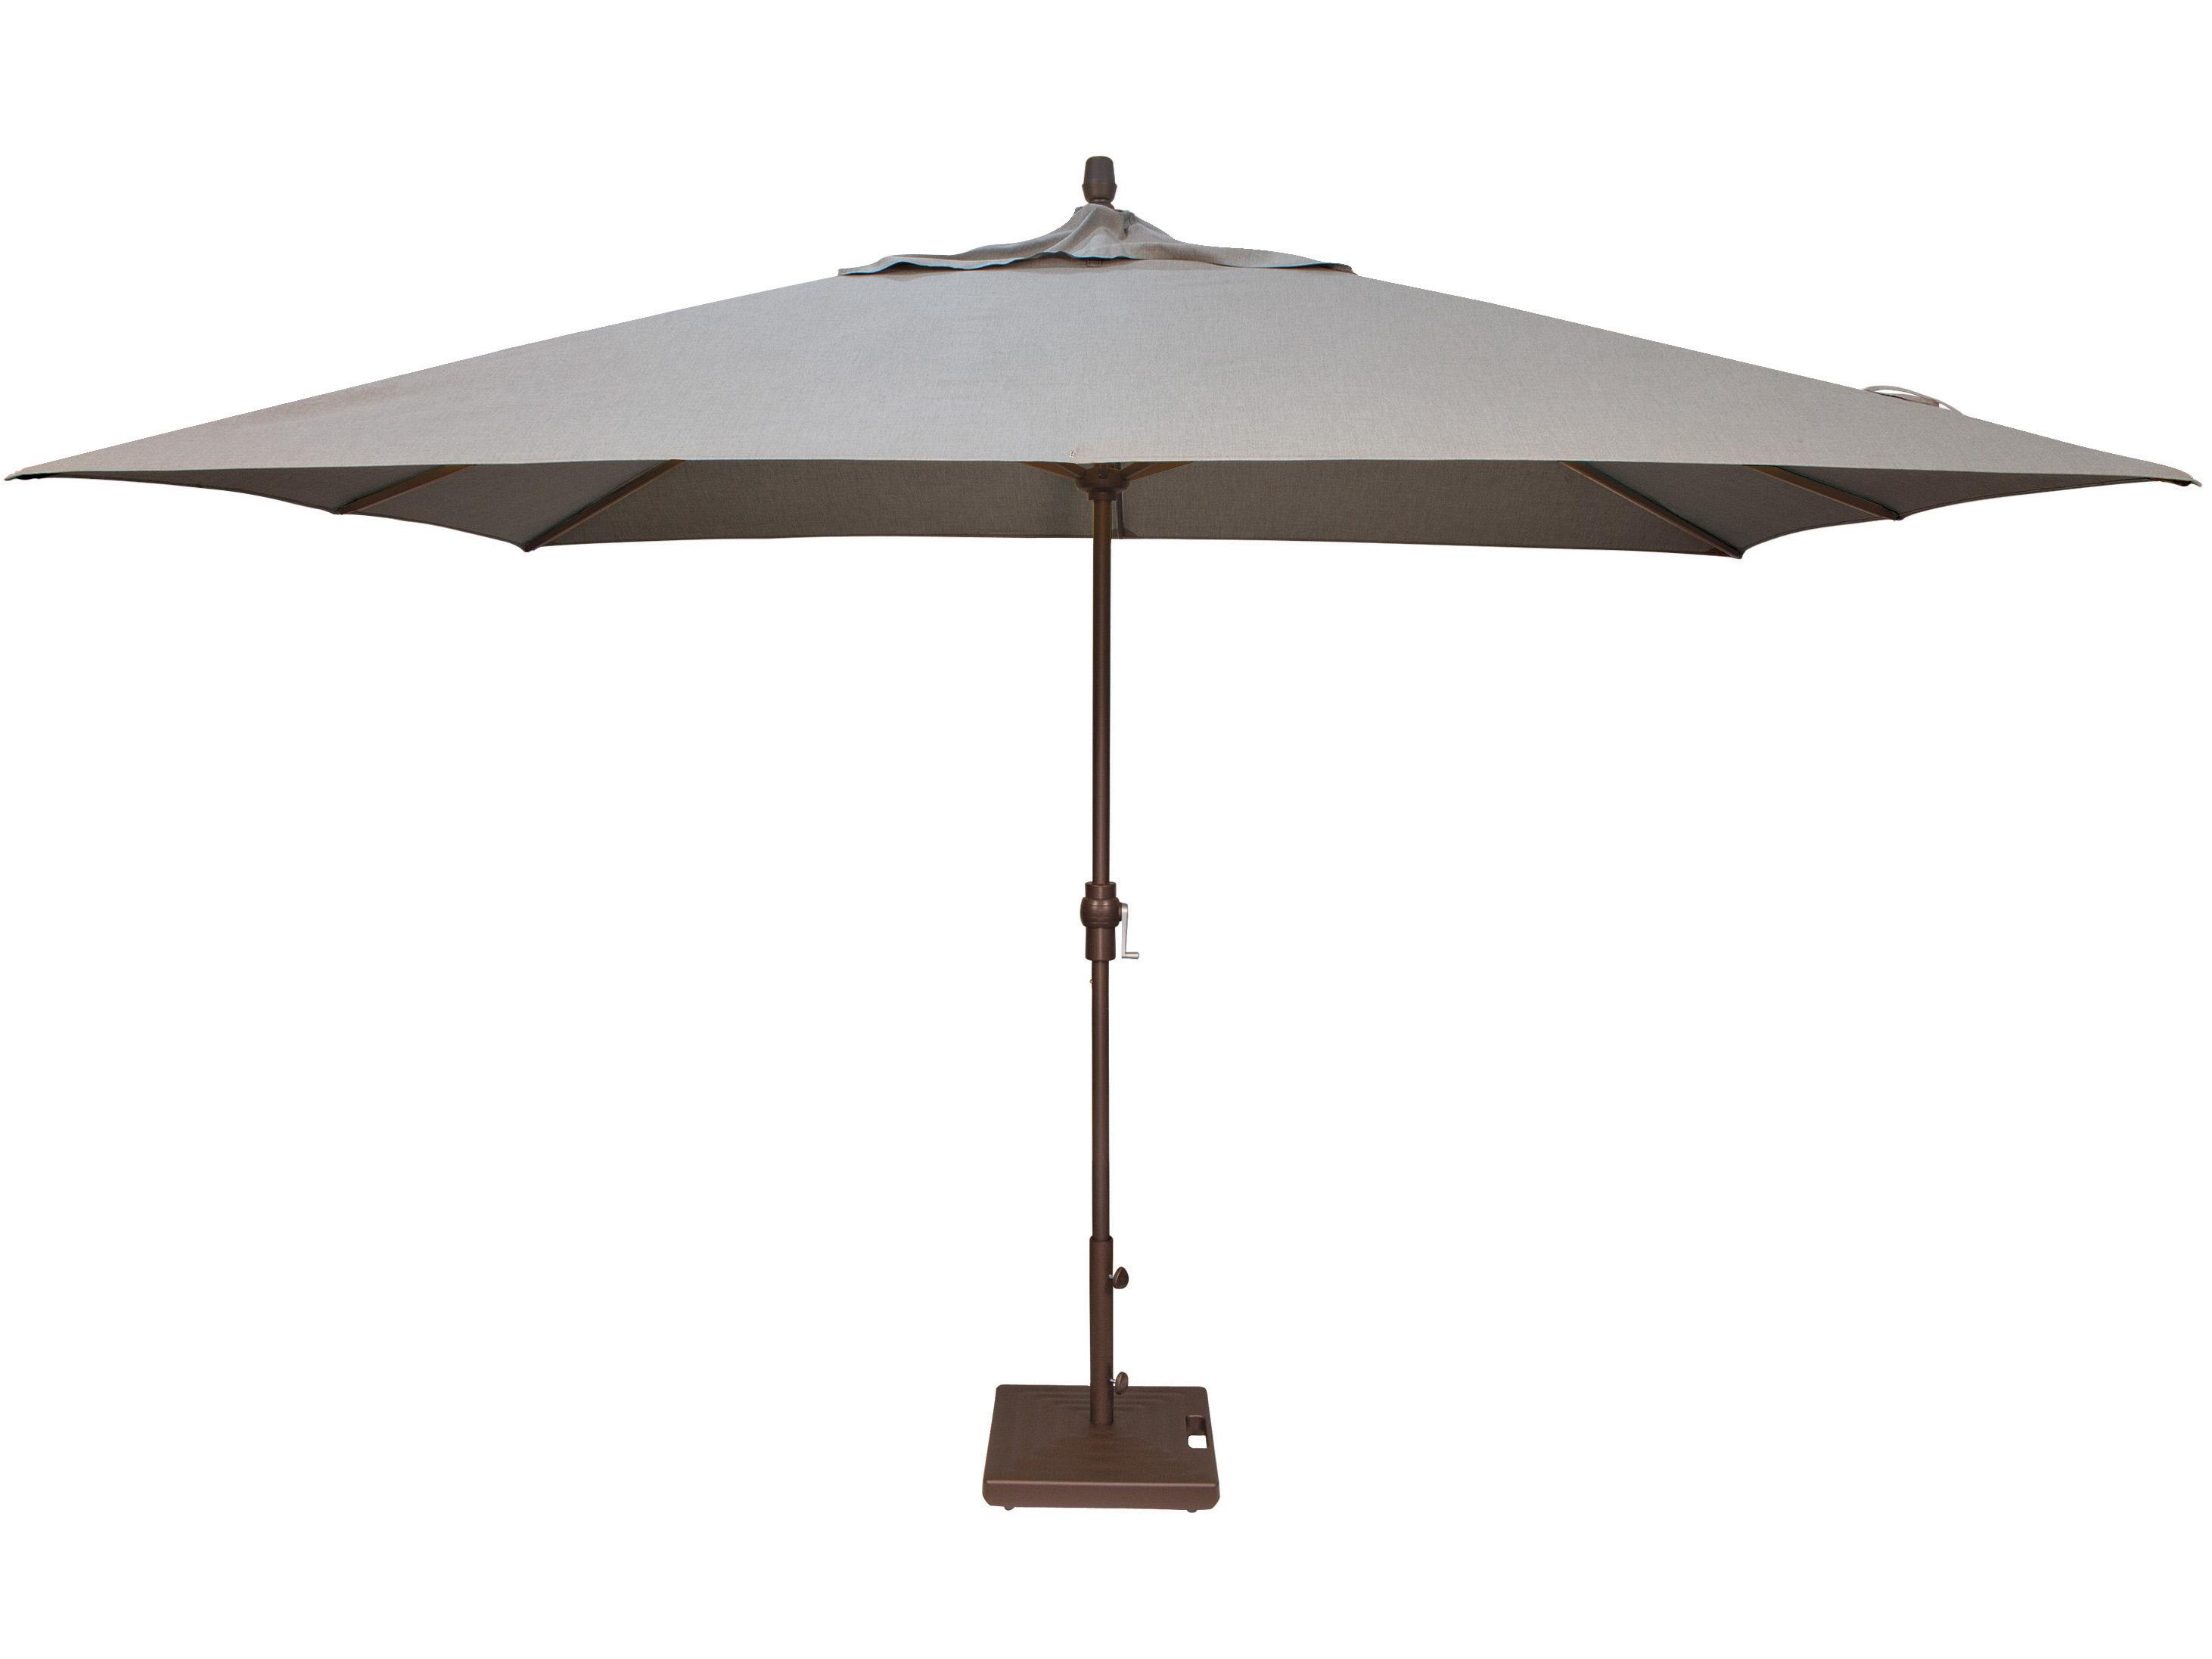 100 11 parasol cantilever umbrella sunbrella fabric for Ikea cantilever umbrella